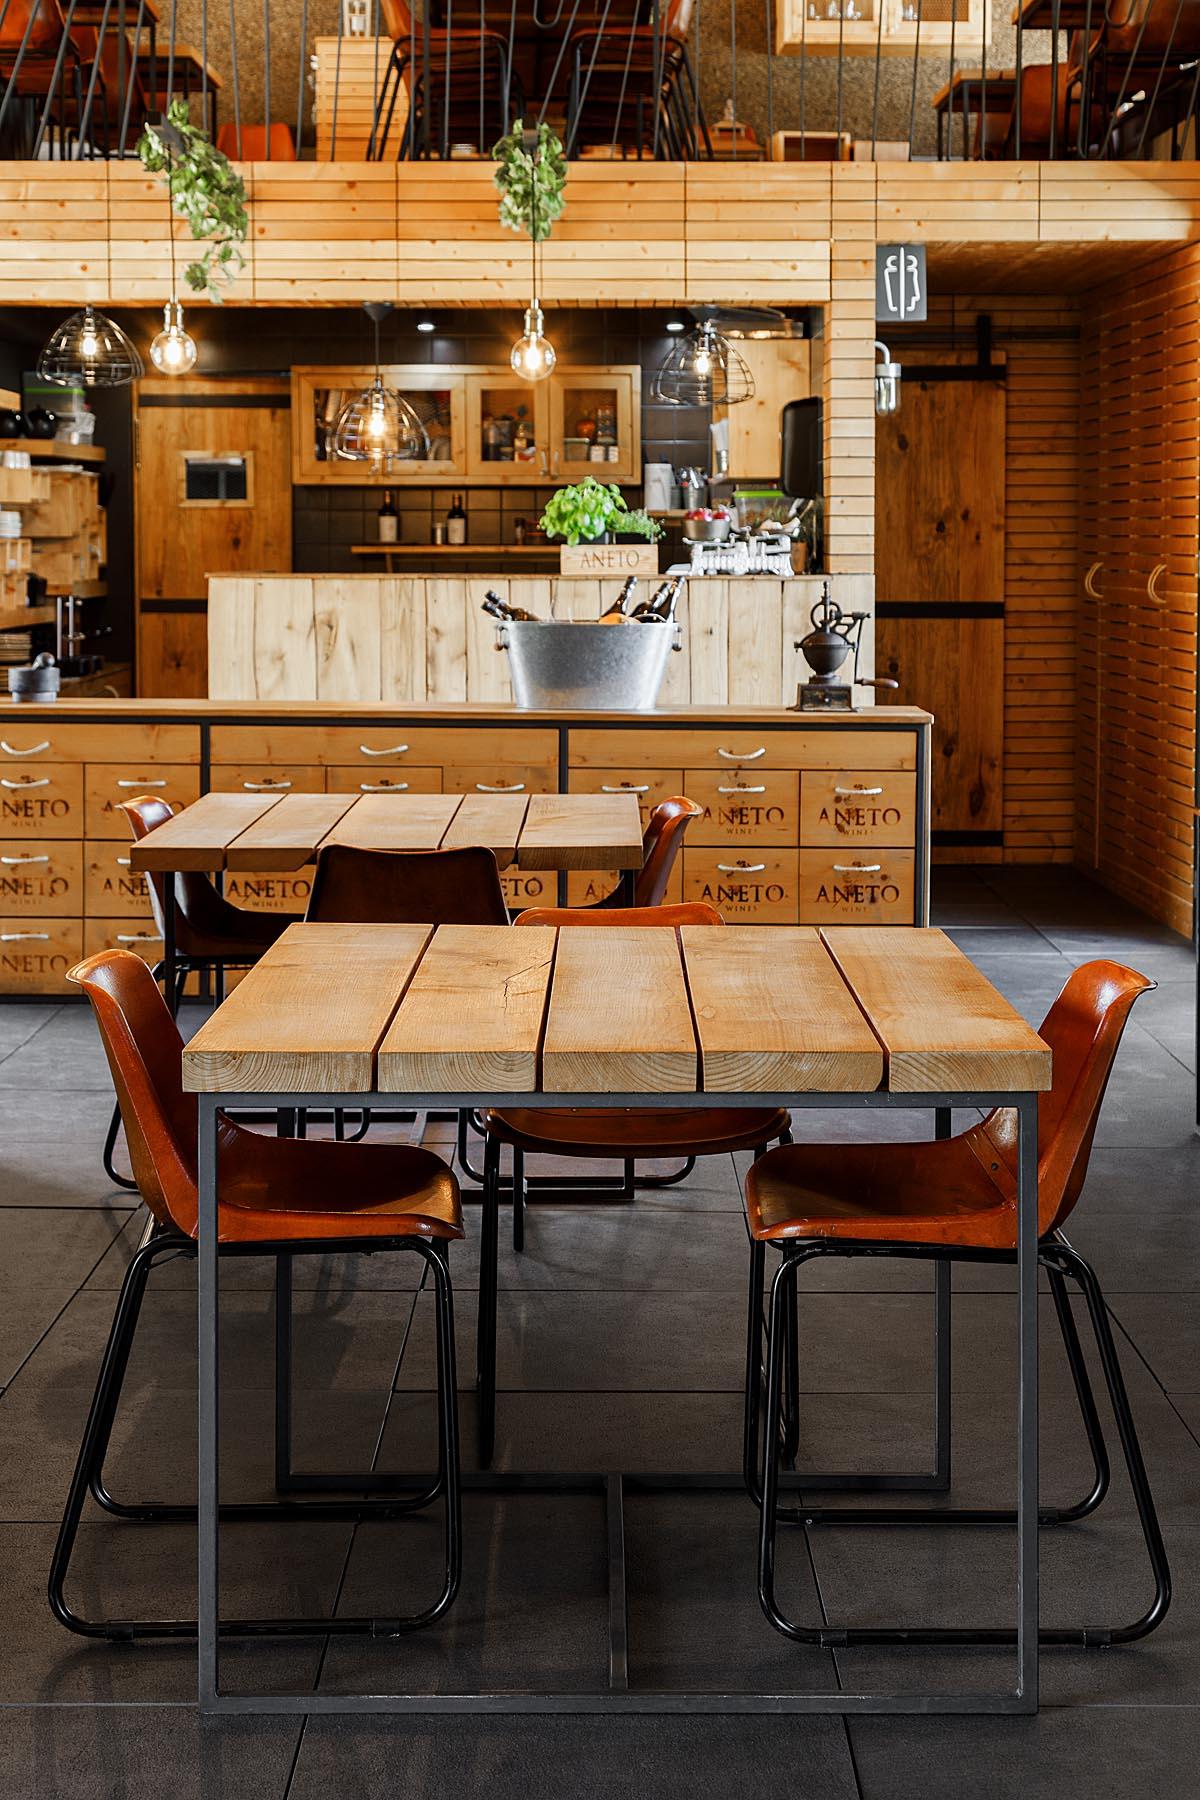 Aneto & Table restaurante na Regua, Lamego do atelier Just an Ar